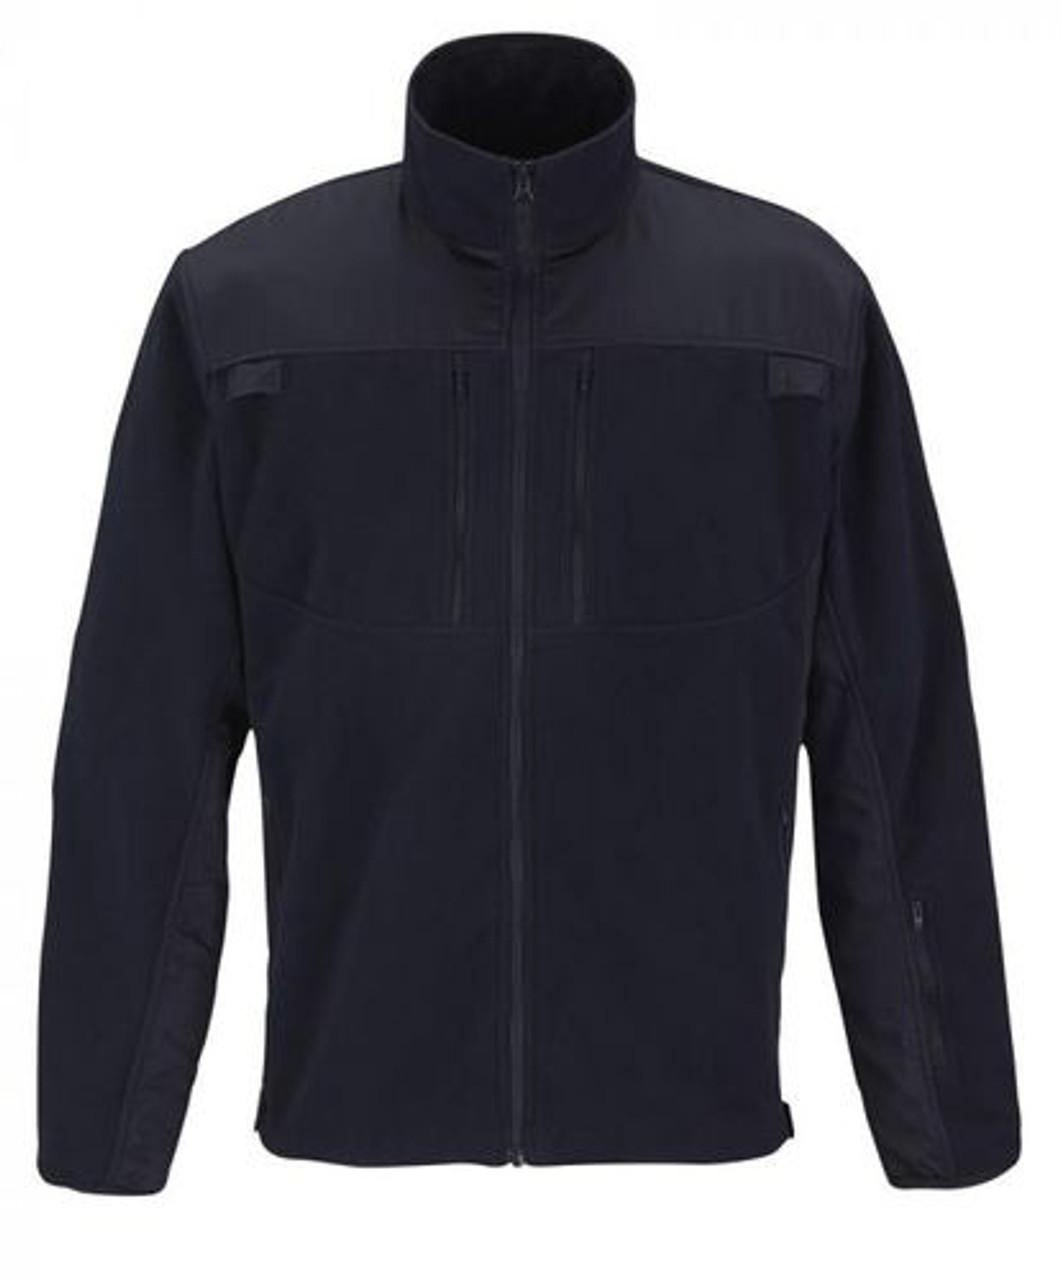 7fbf98f84 Propper® Cold Weather Tactical Fleece Jacket, 100% Polyester Fleece, Badge  Tab, 5-Pocket Design, choose Black and LAPD Navy, F5431